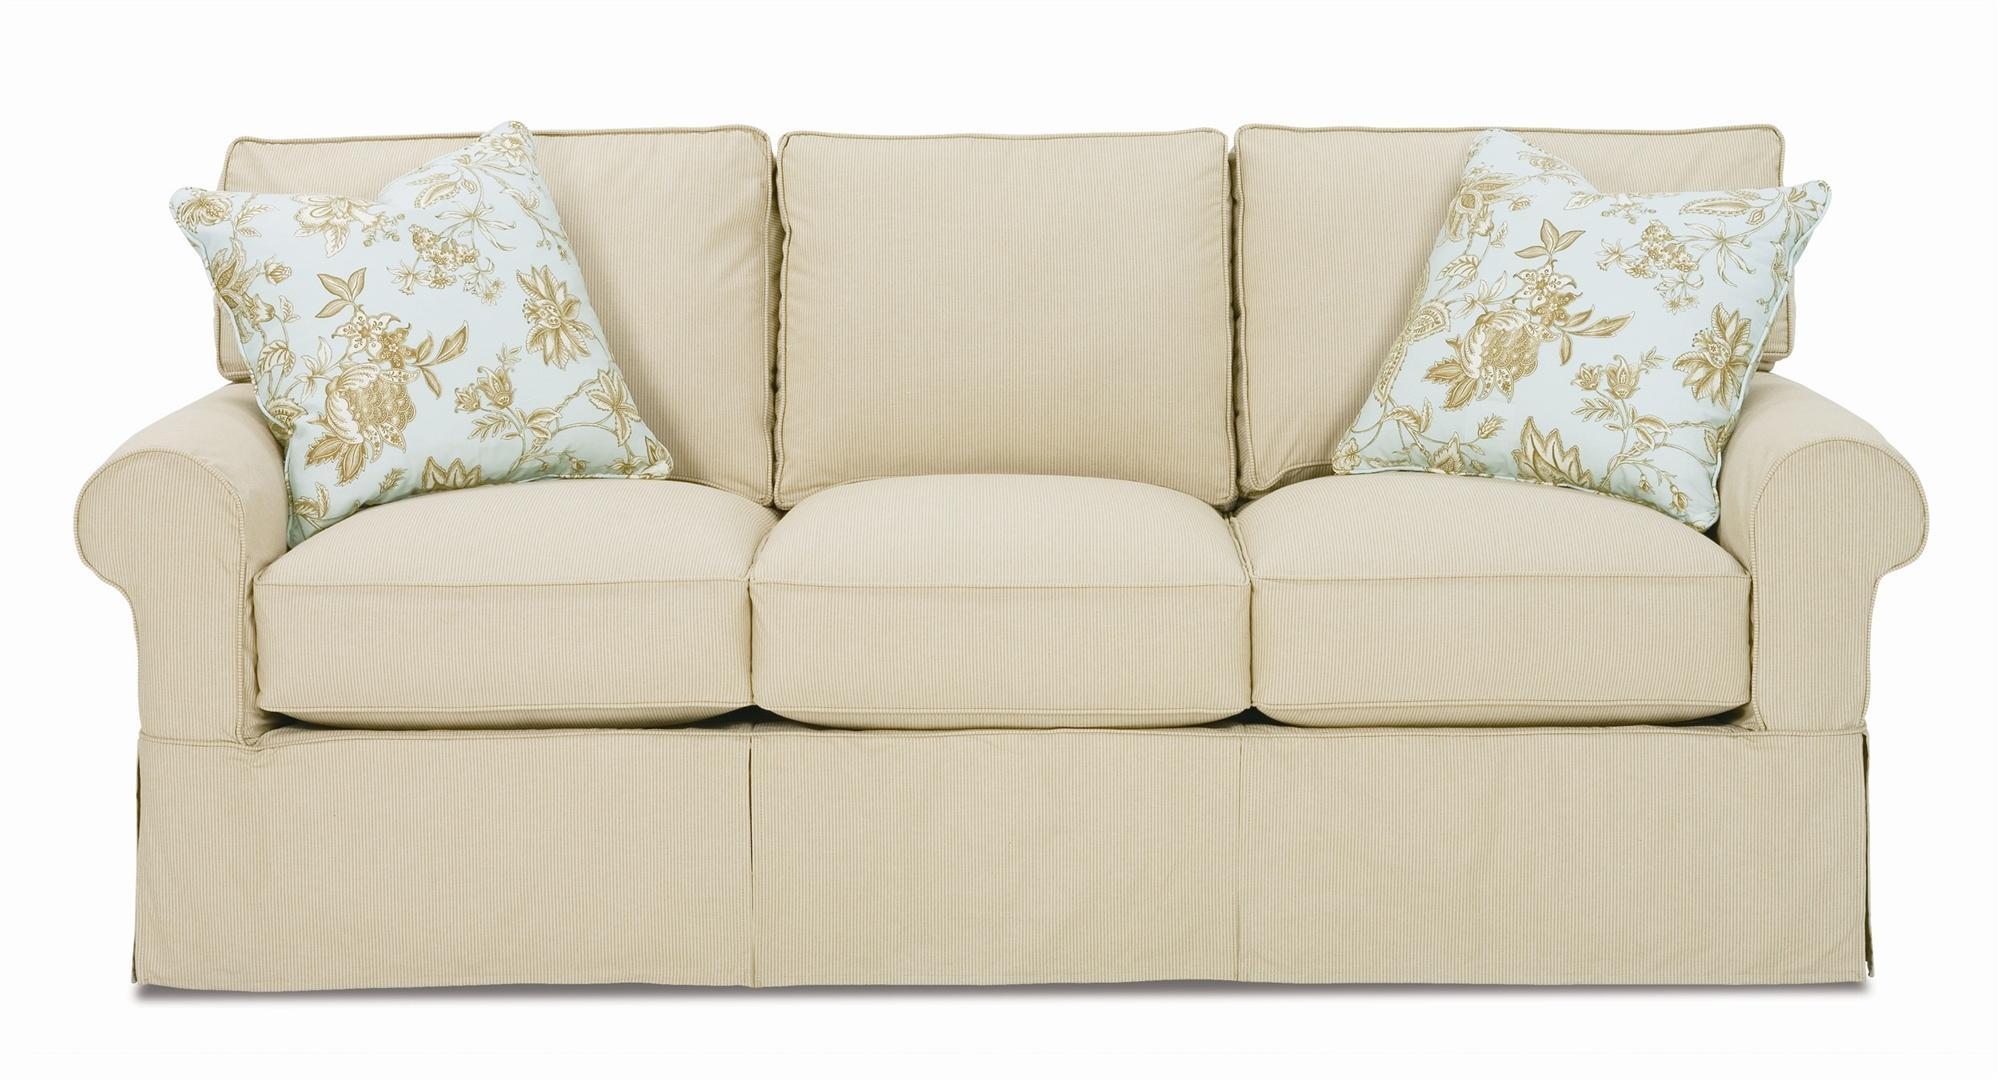 Quality Interiors | Sofa Slipcover | Chair Slipcovers for Slipcovers Sofas